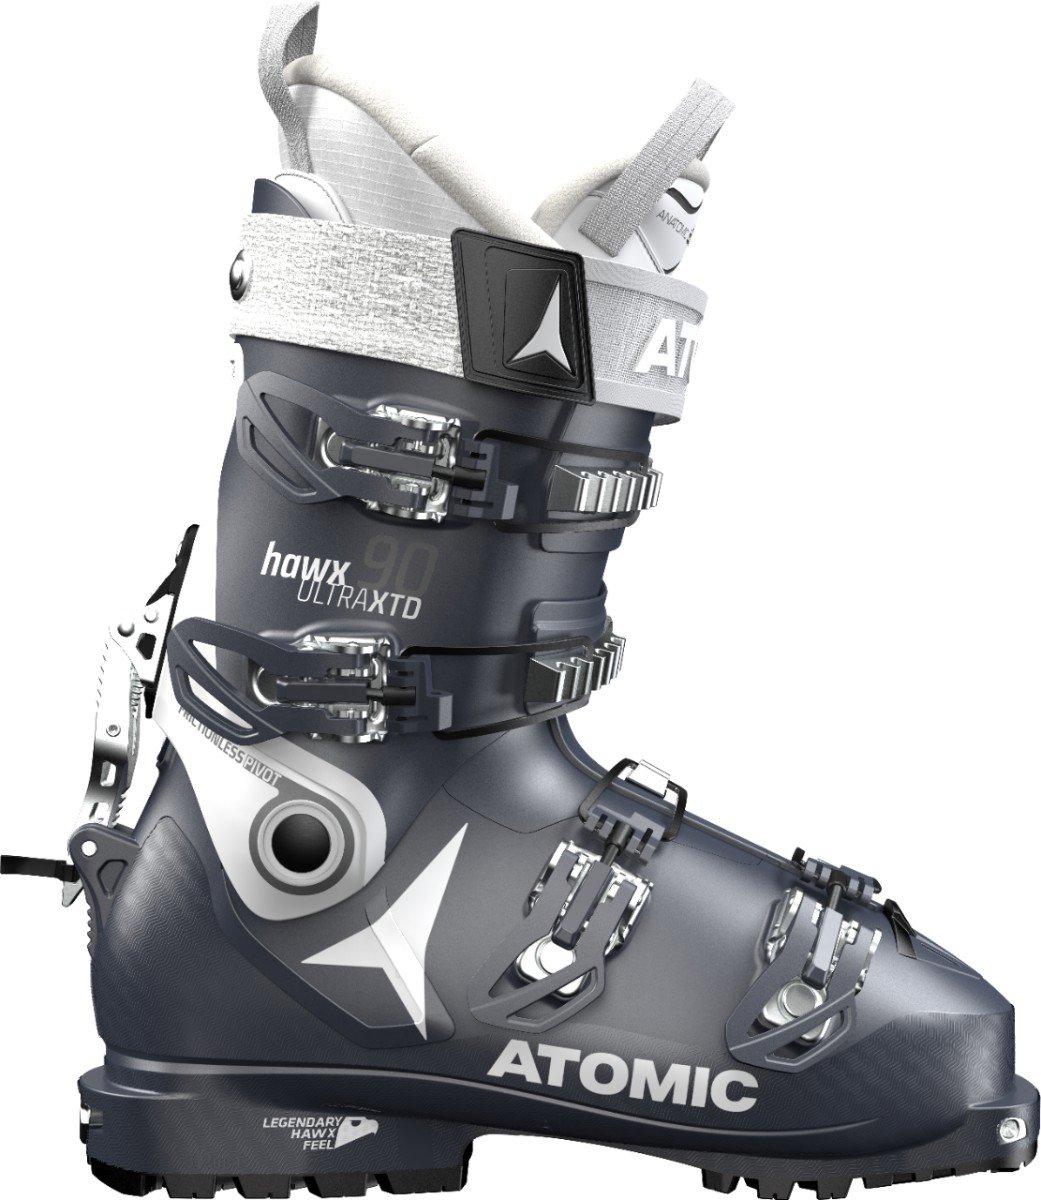 Atomic Hawx Ultra XTD 90 W 18/19